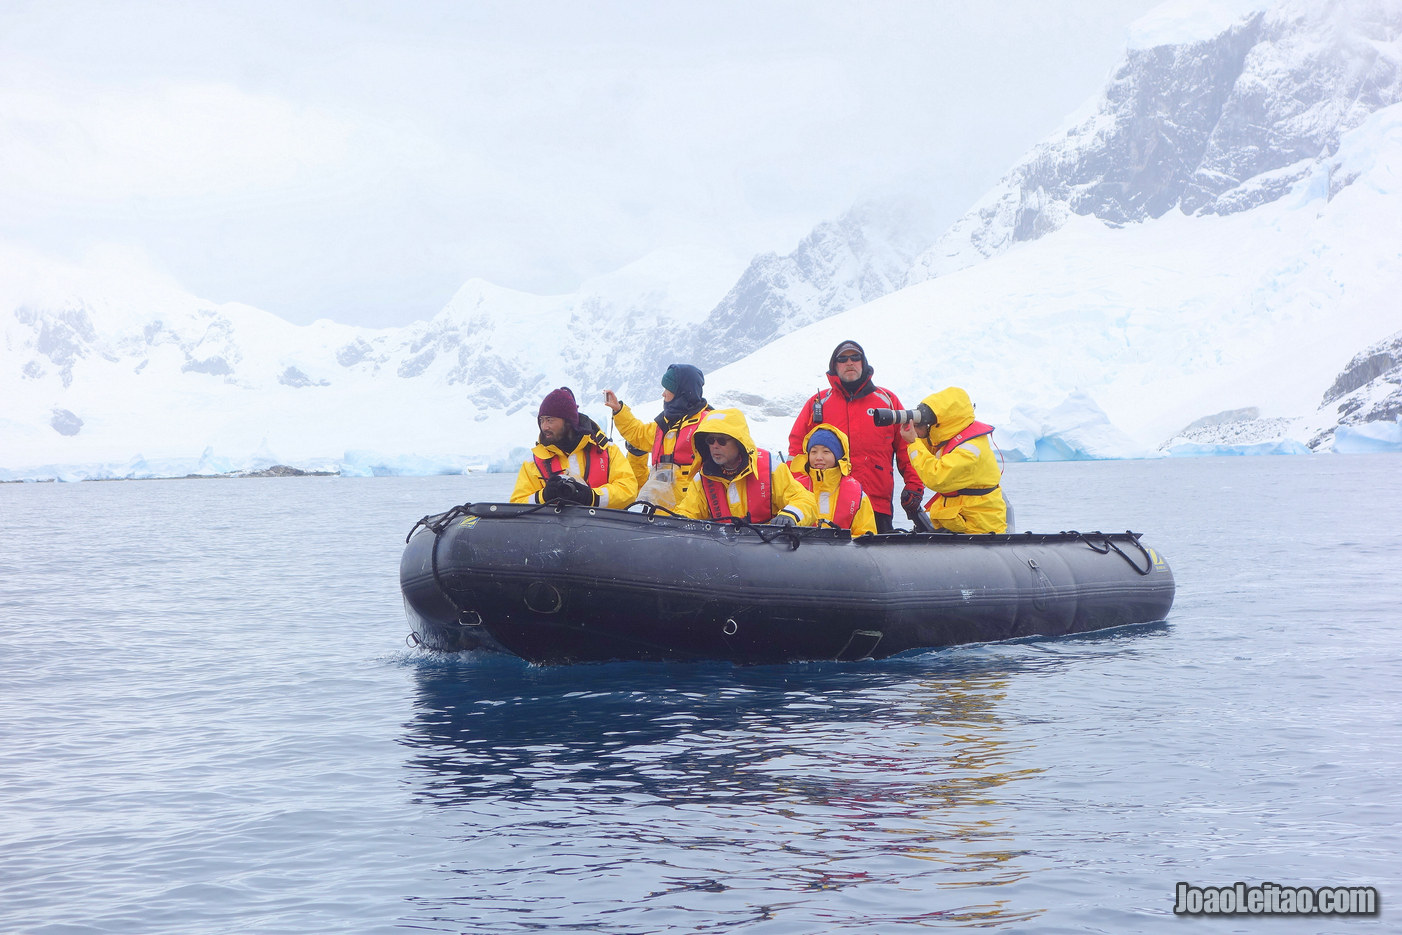 Passear de Barco Semi-Rígido na Antártida